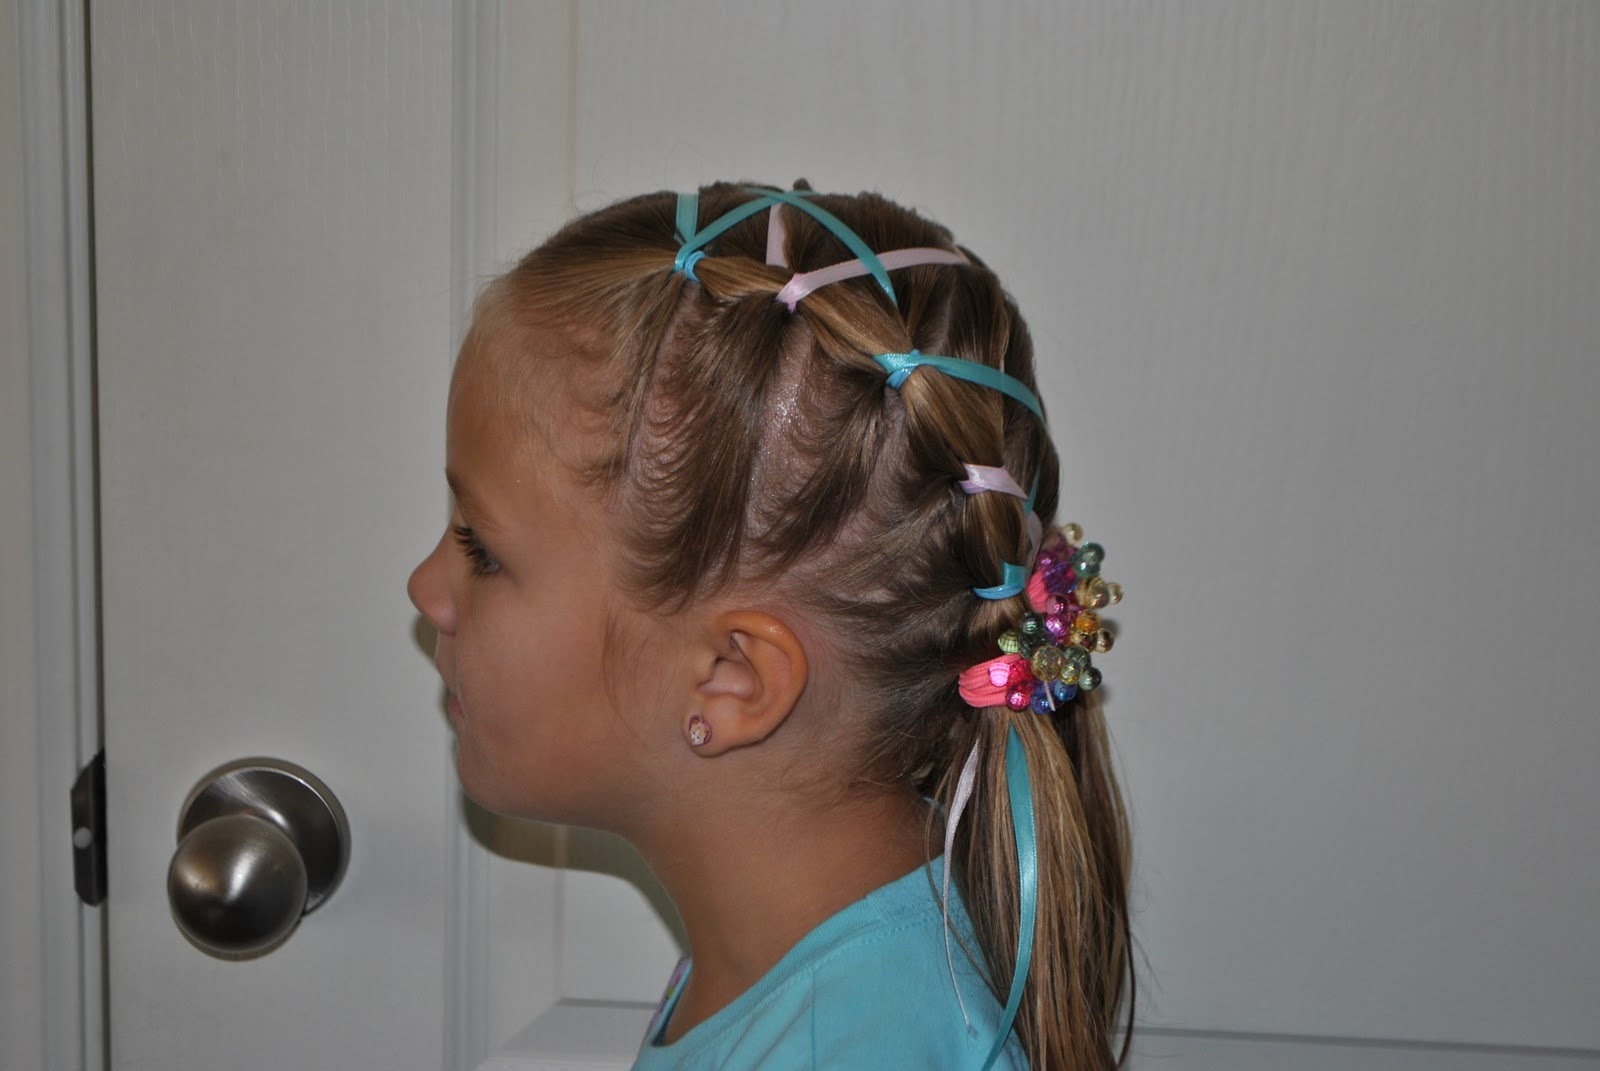 Rapunzel, Rapunzel, let down your golden hair: Rubber band ...